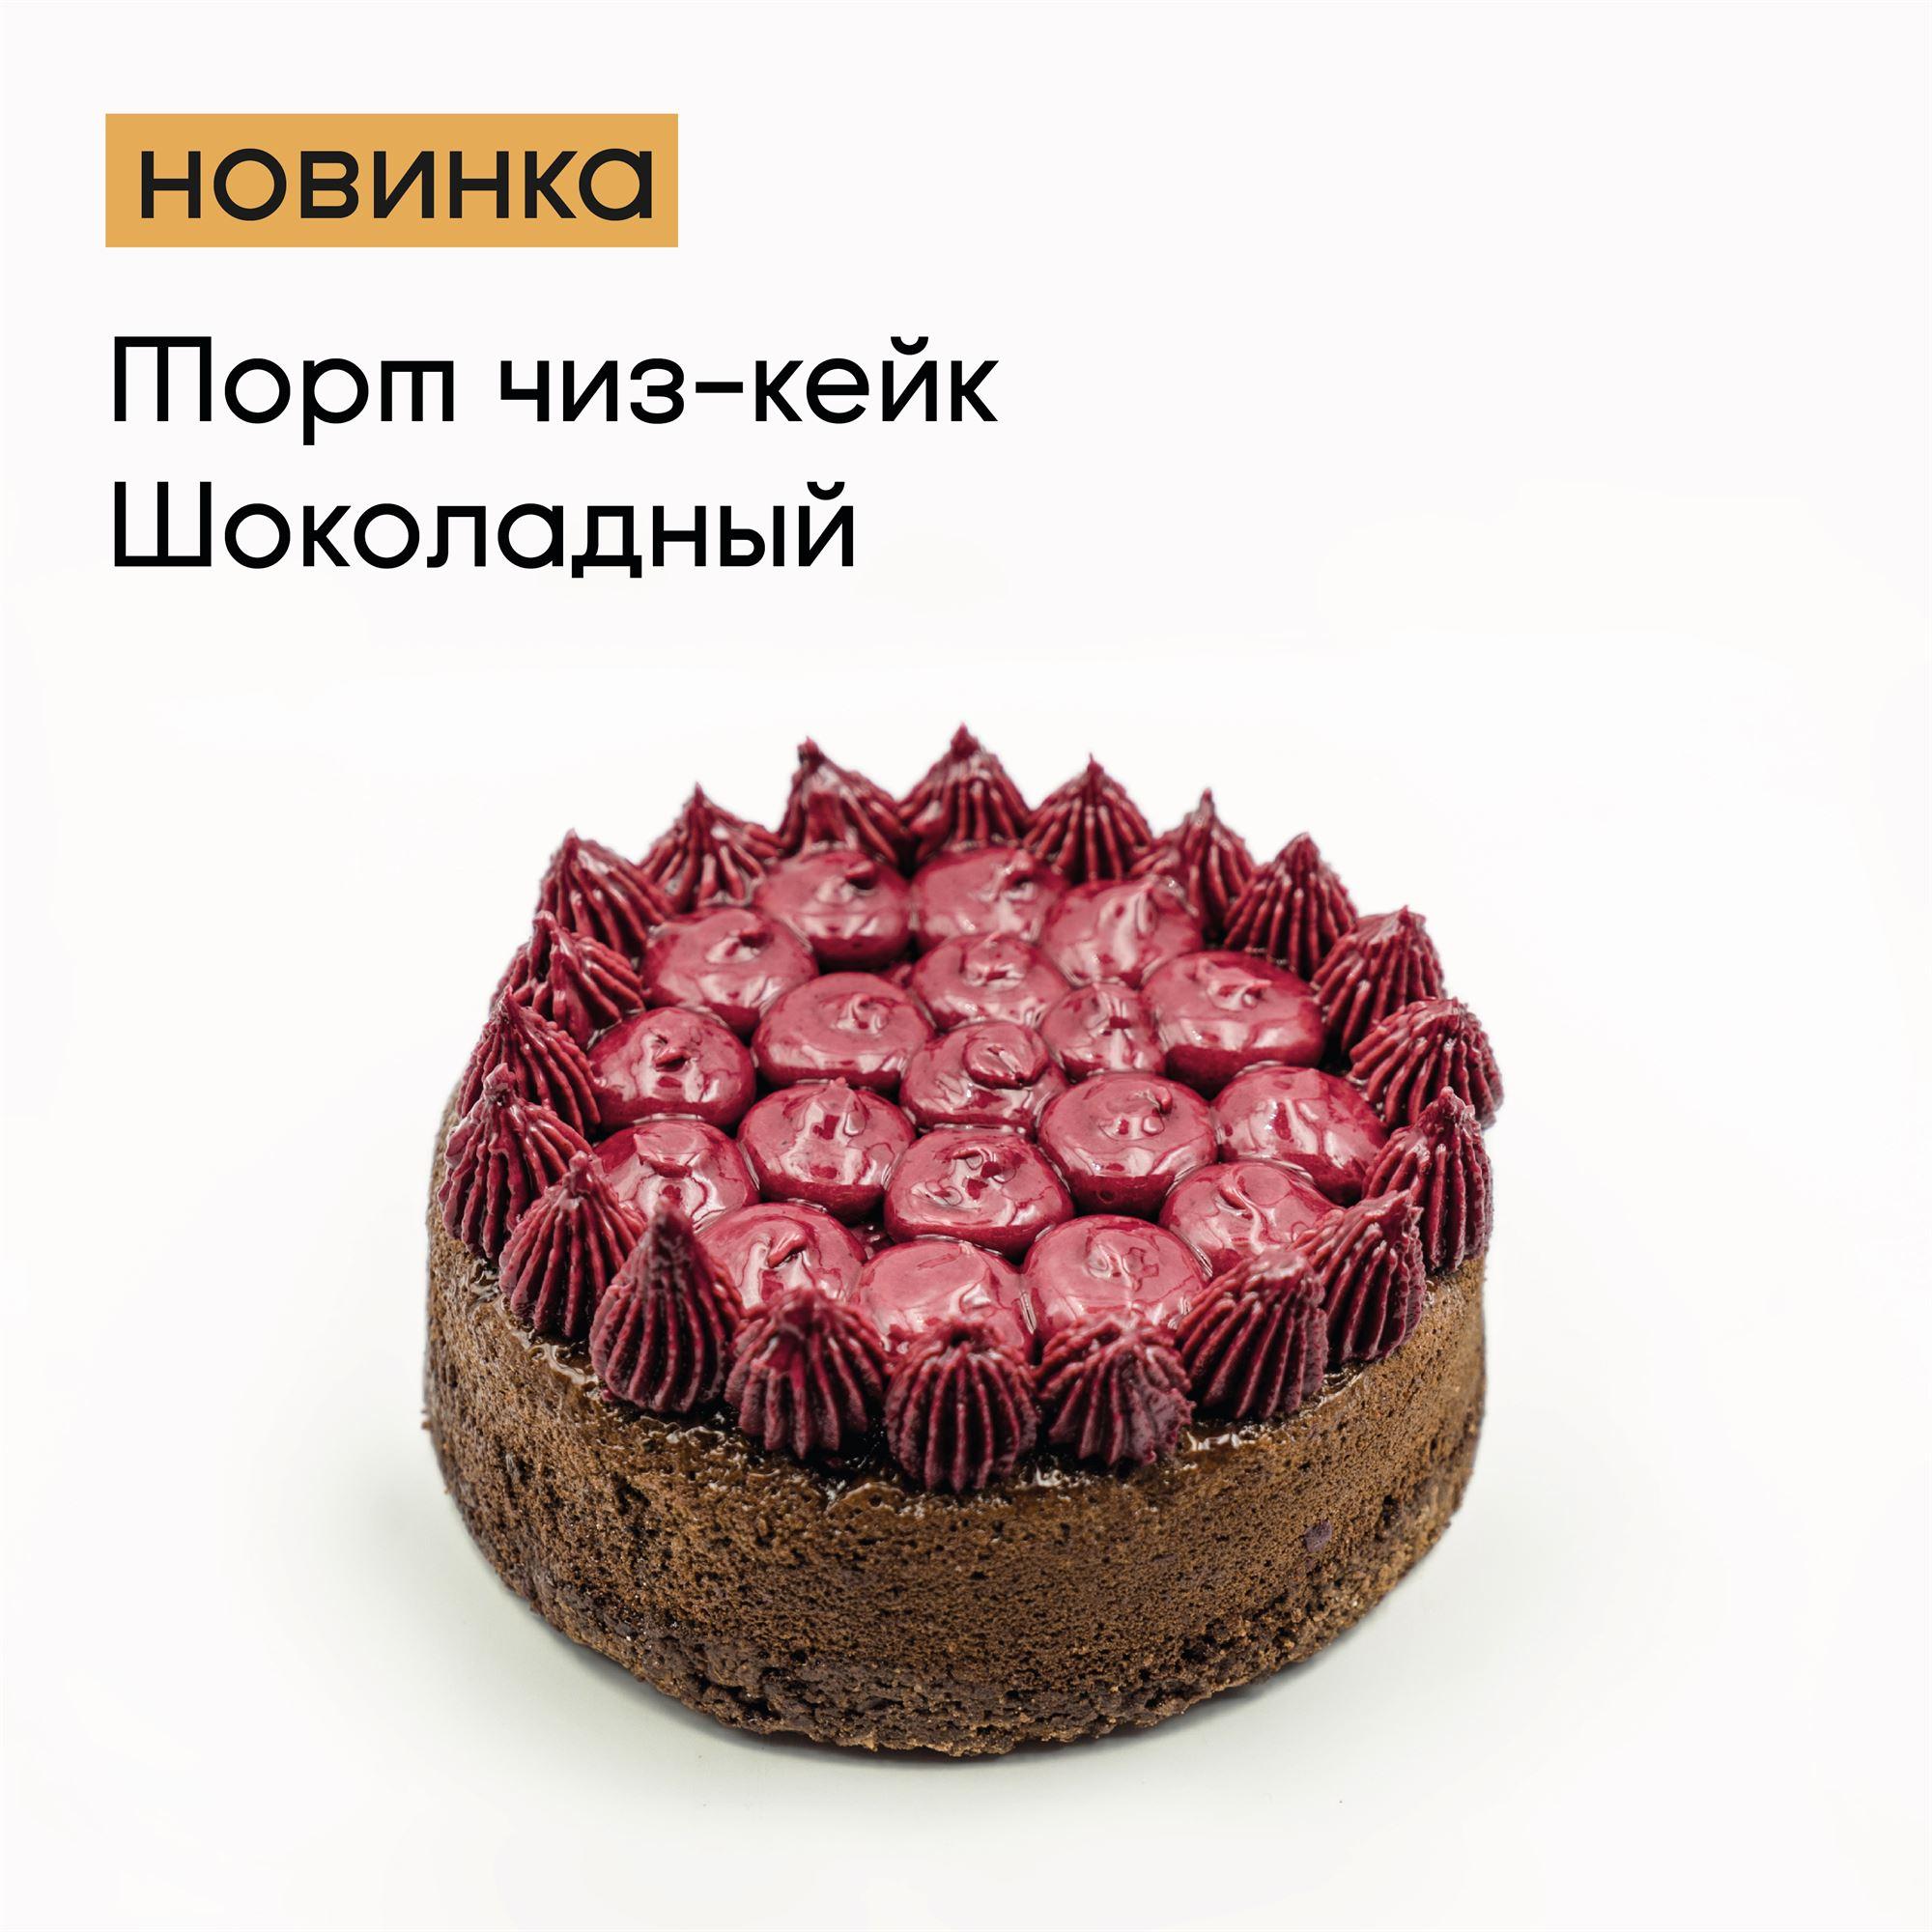 Новинка – Чиз-кейк Шоколадный